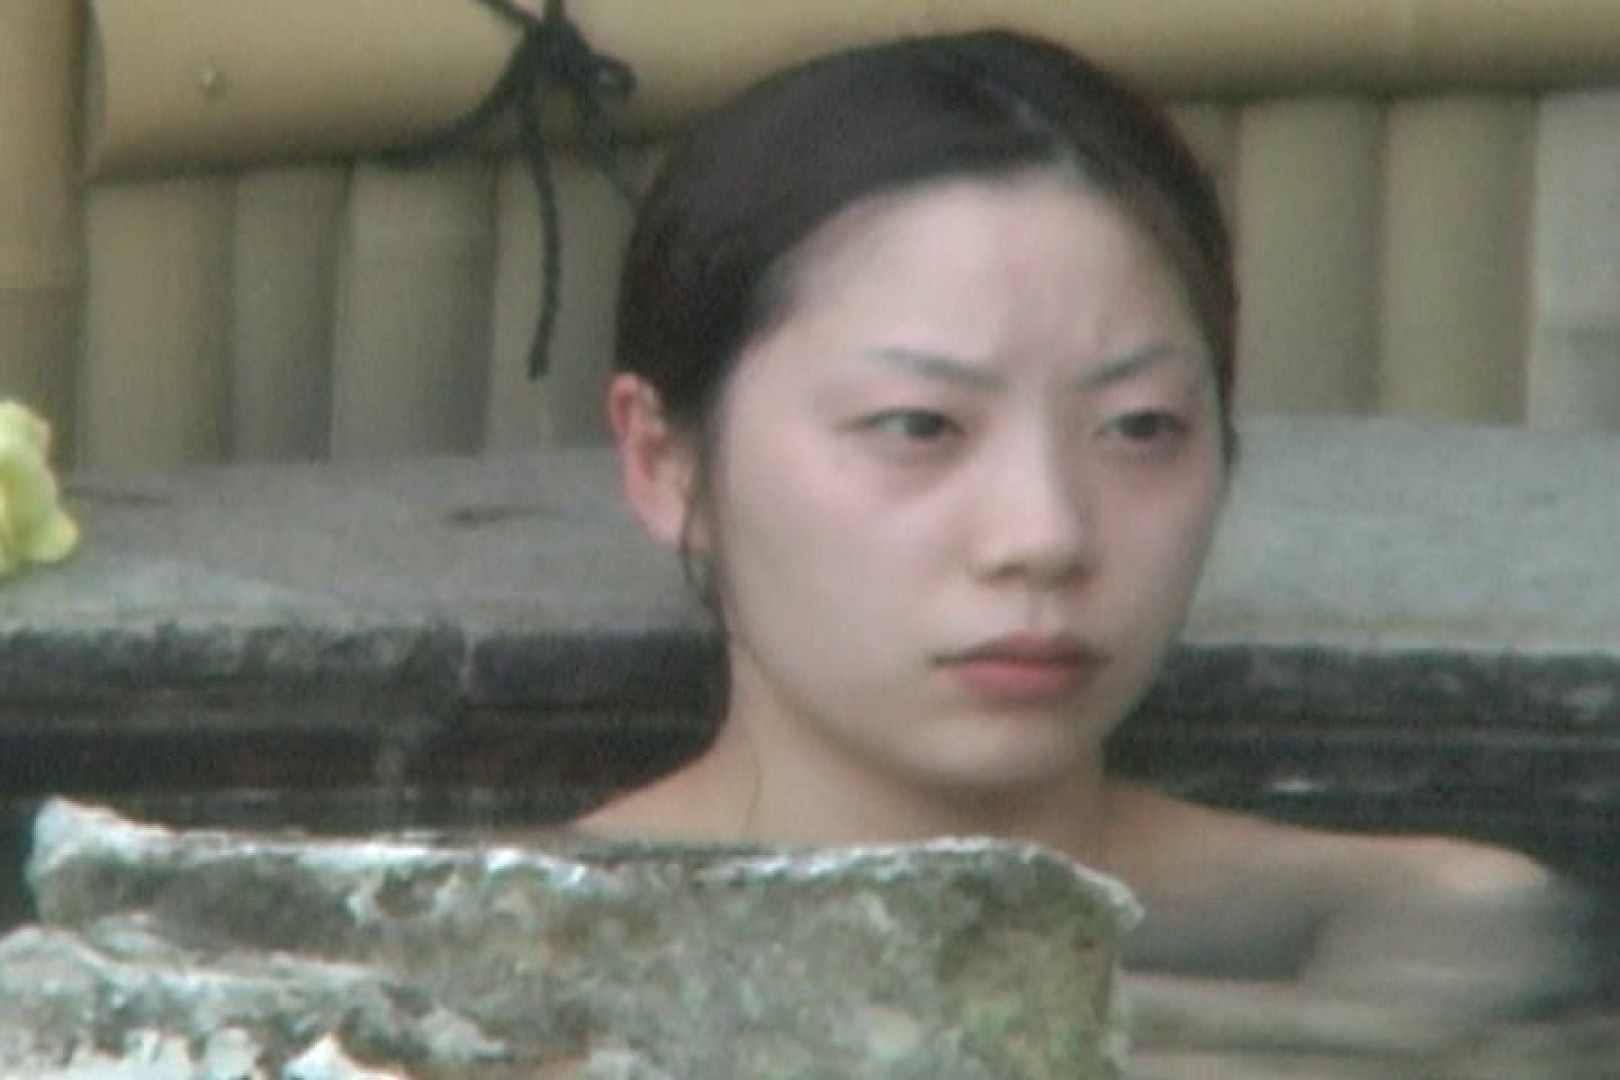 Aquaな露天風呂Vol.596 盗撮シリーズ | 露天風呂編  113PIX 15